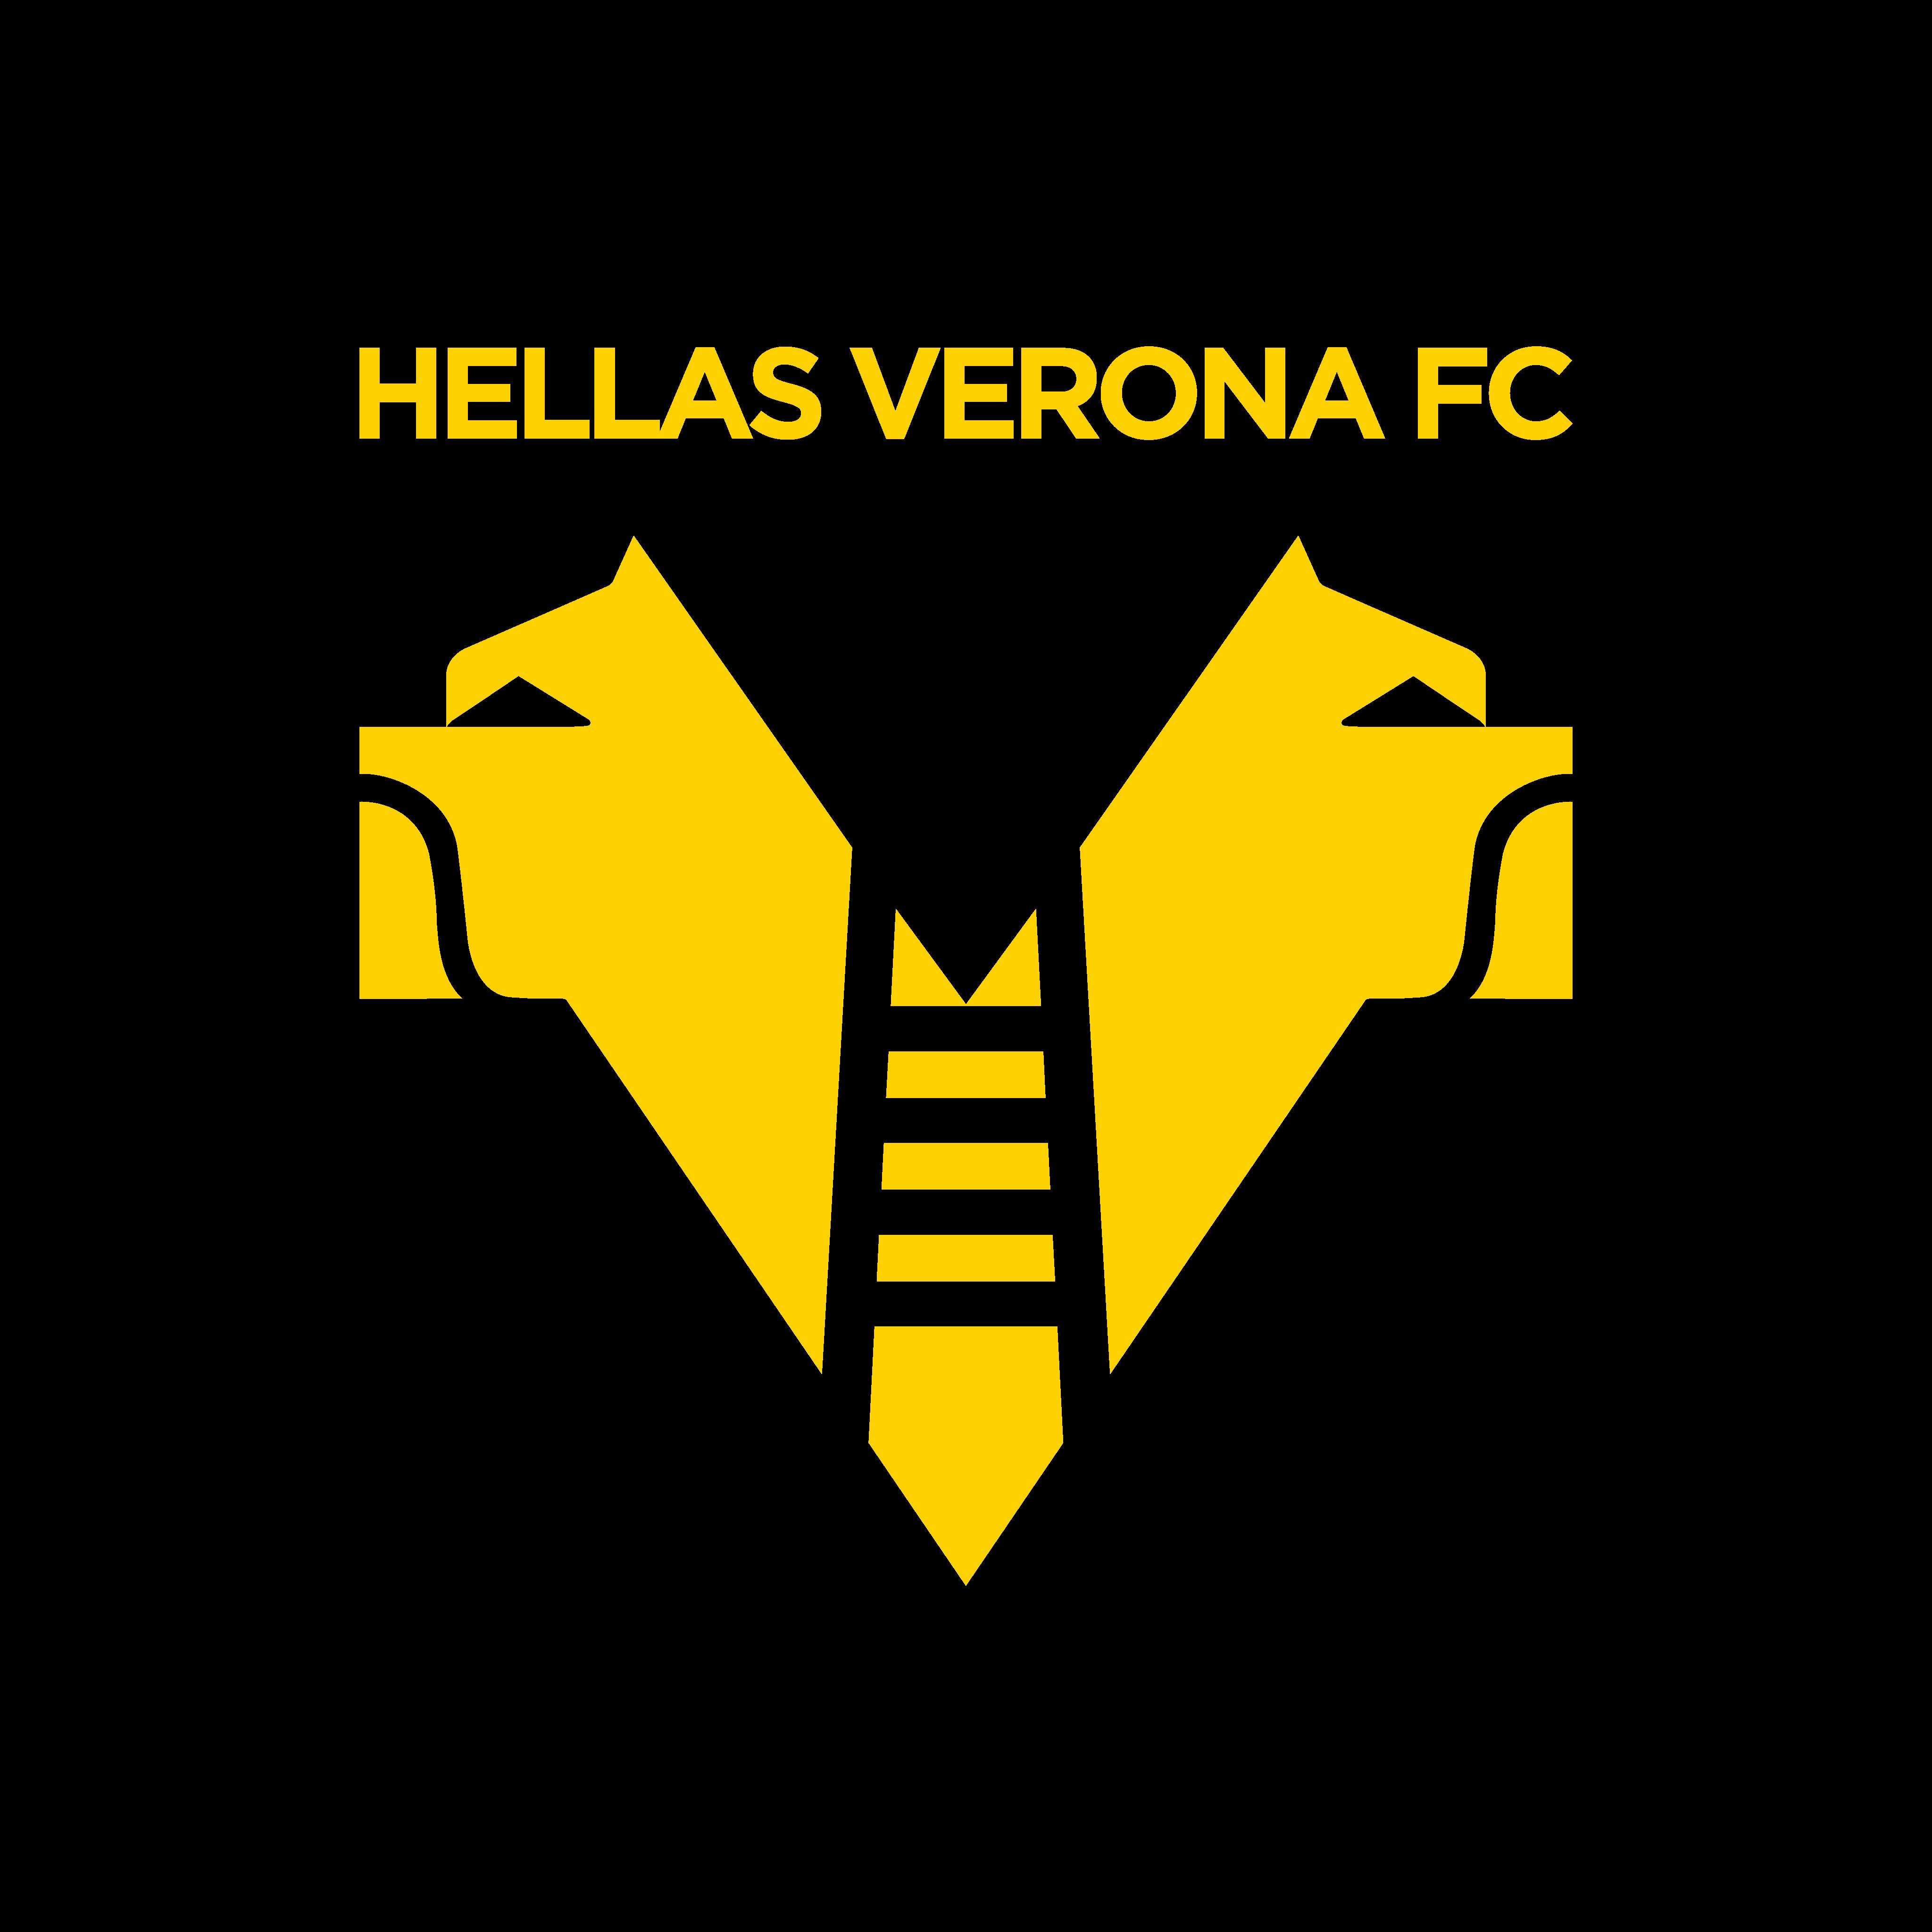 hellas verona fc logo 0 - Hellas Verona FC Logo